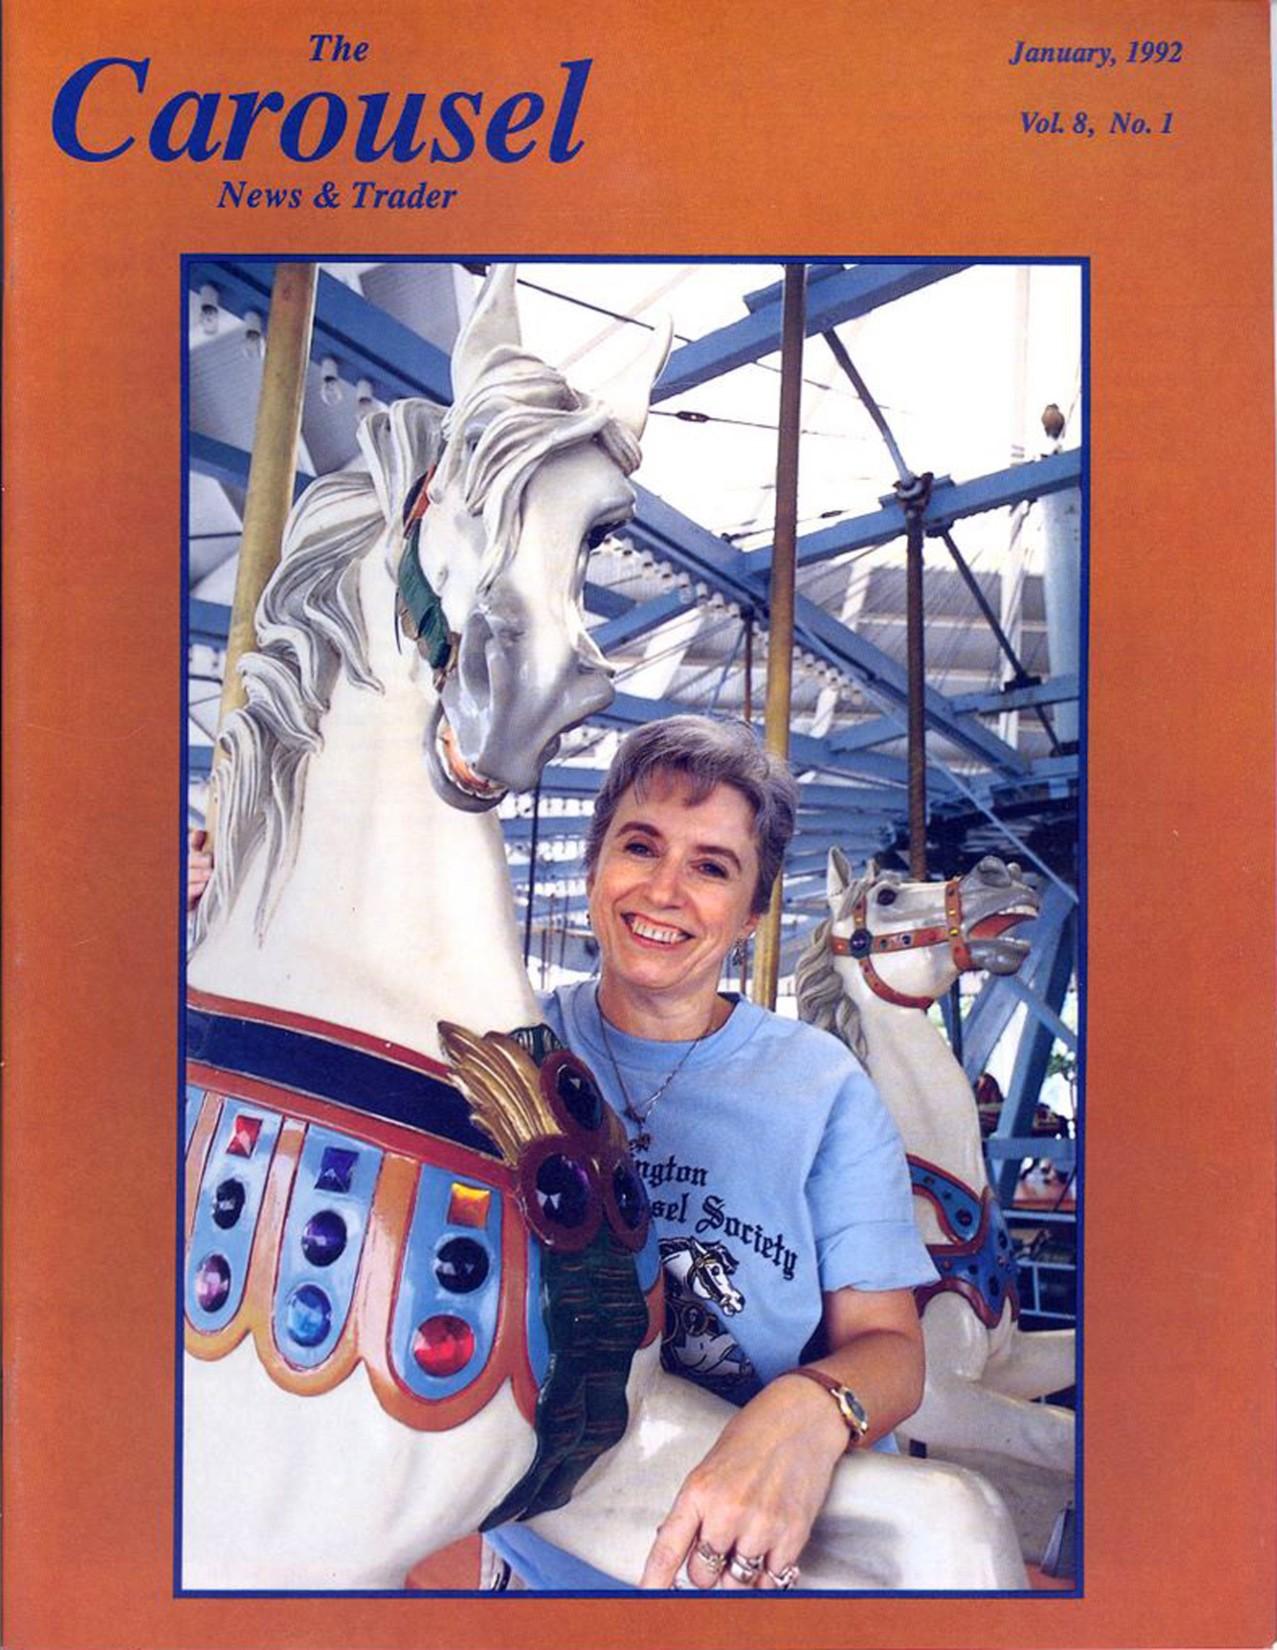 cnt_01_1992-Carol-Perron-Looff-carousel-Ameriflora-92